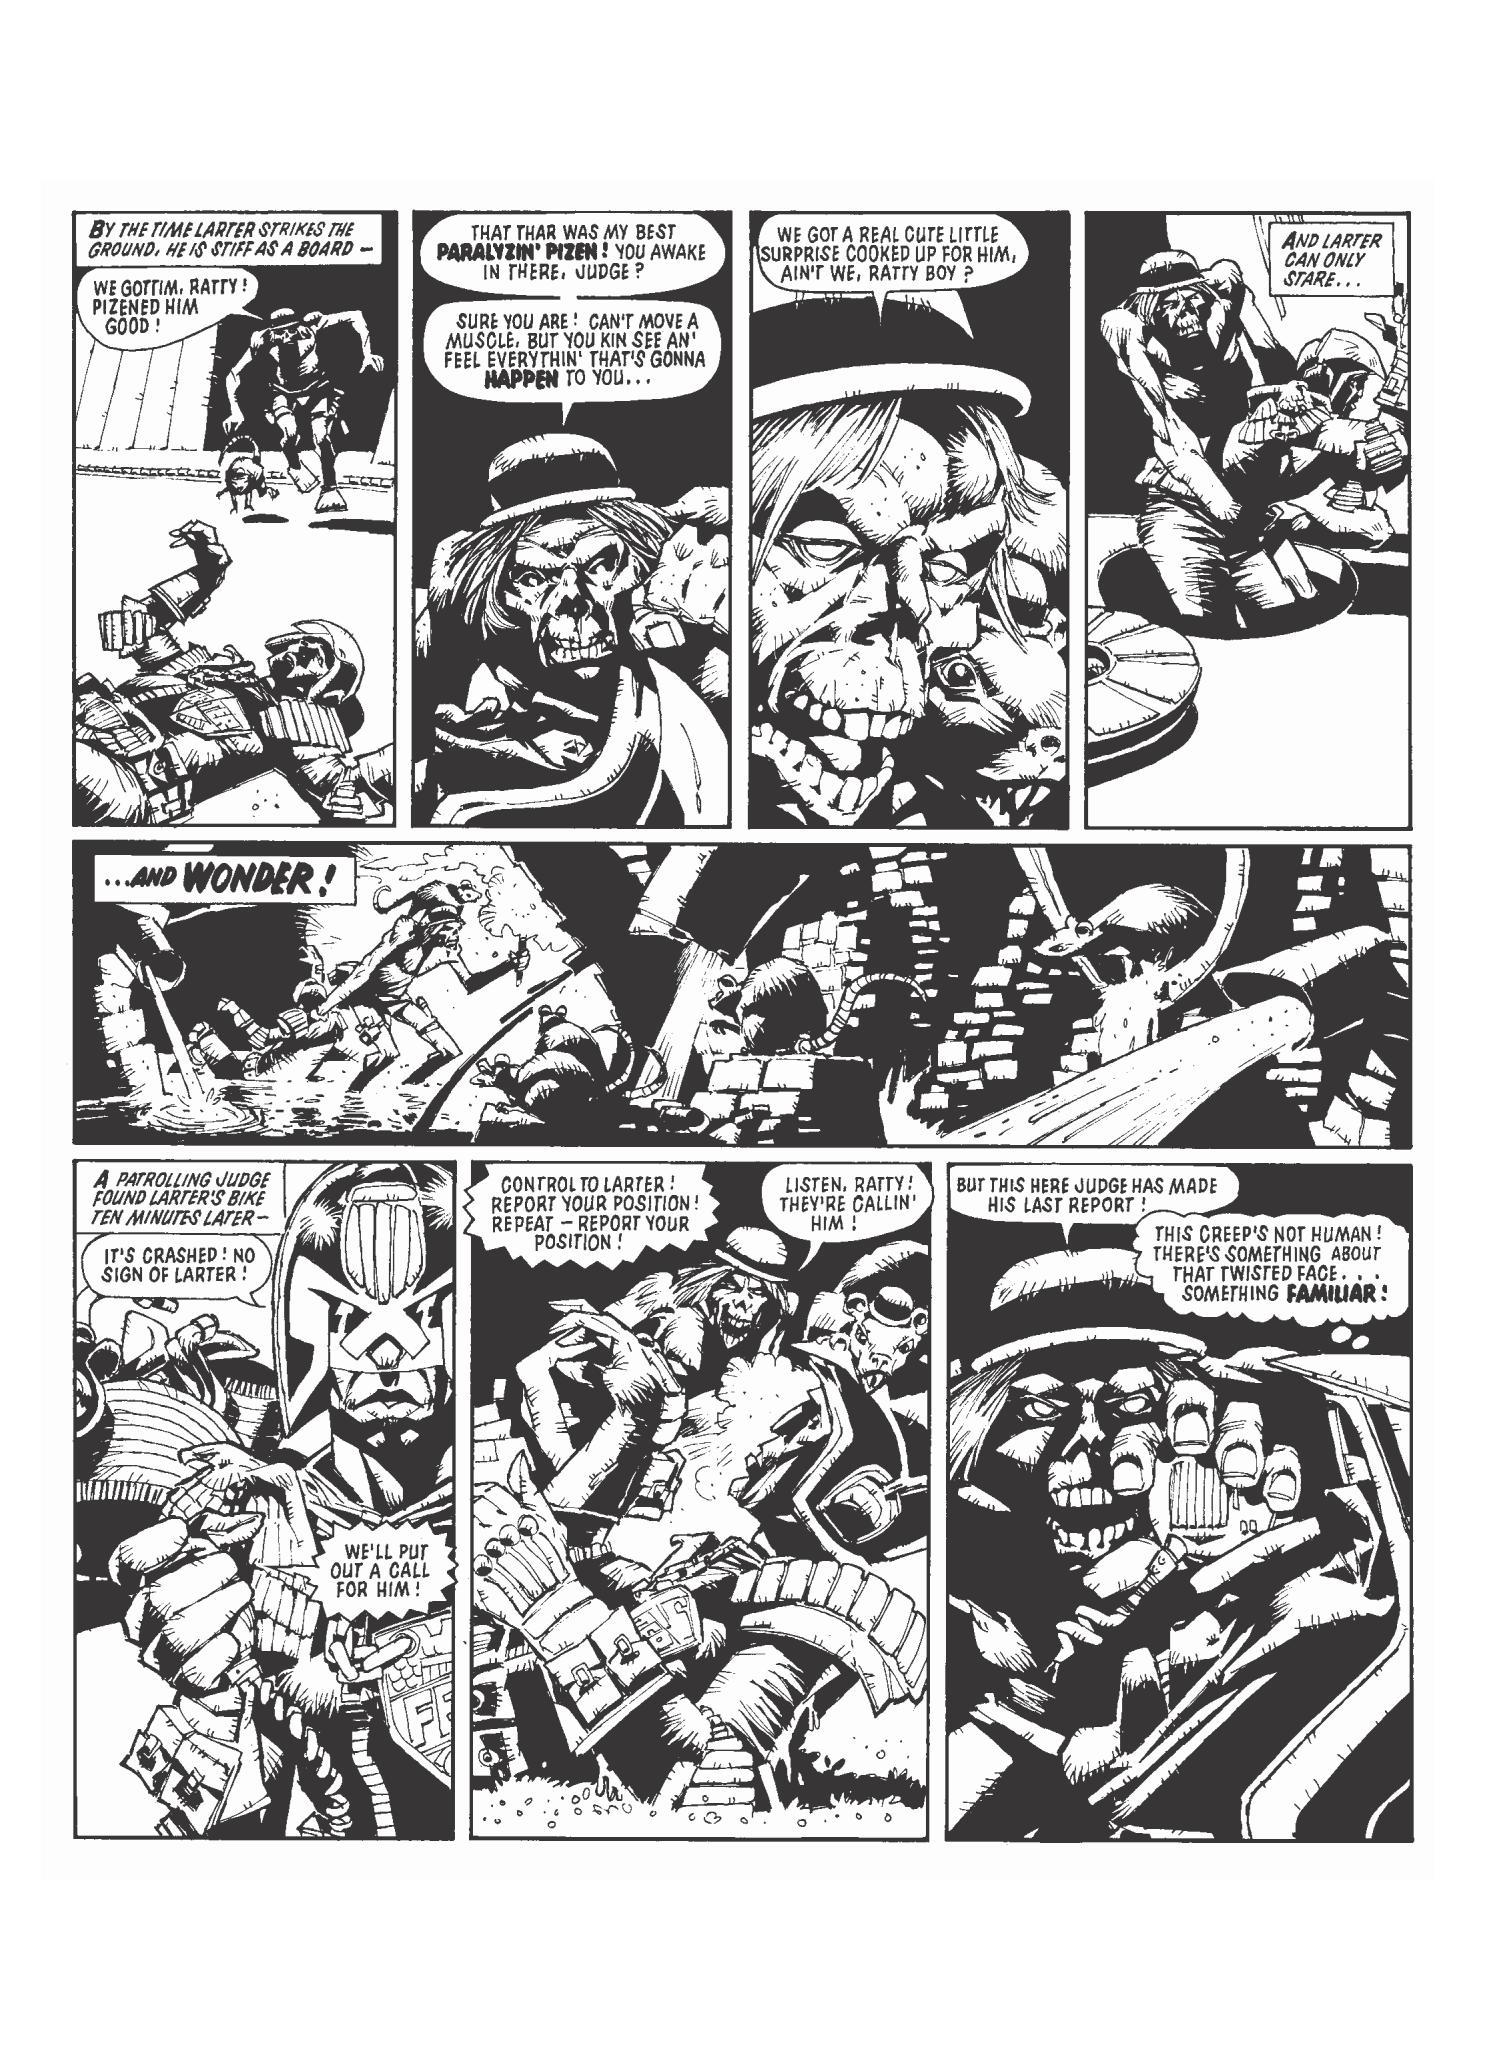 Judge Dredd 3 graphic novel review